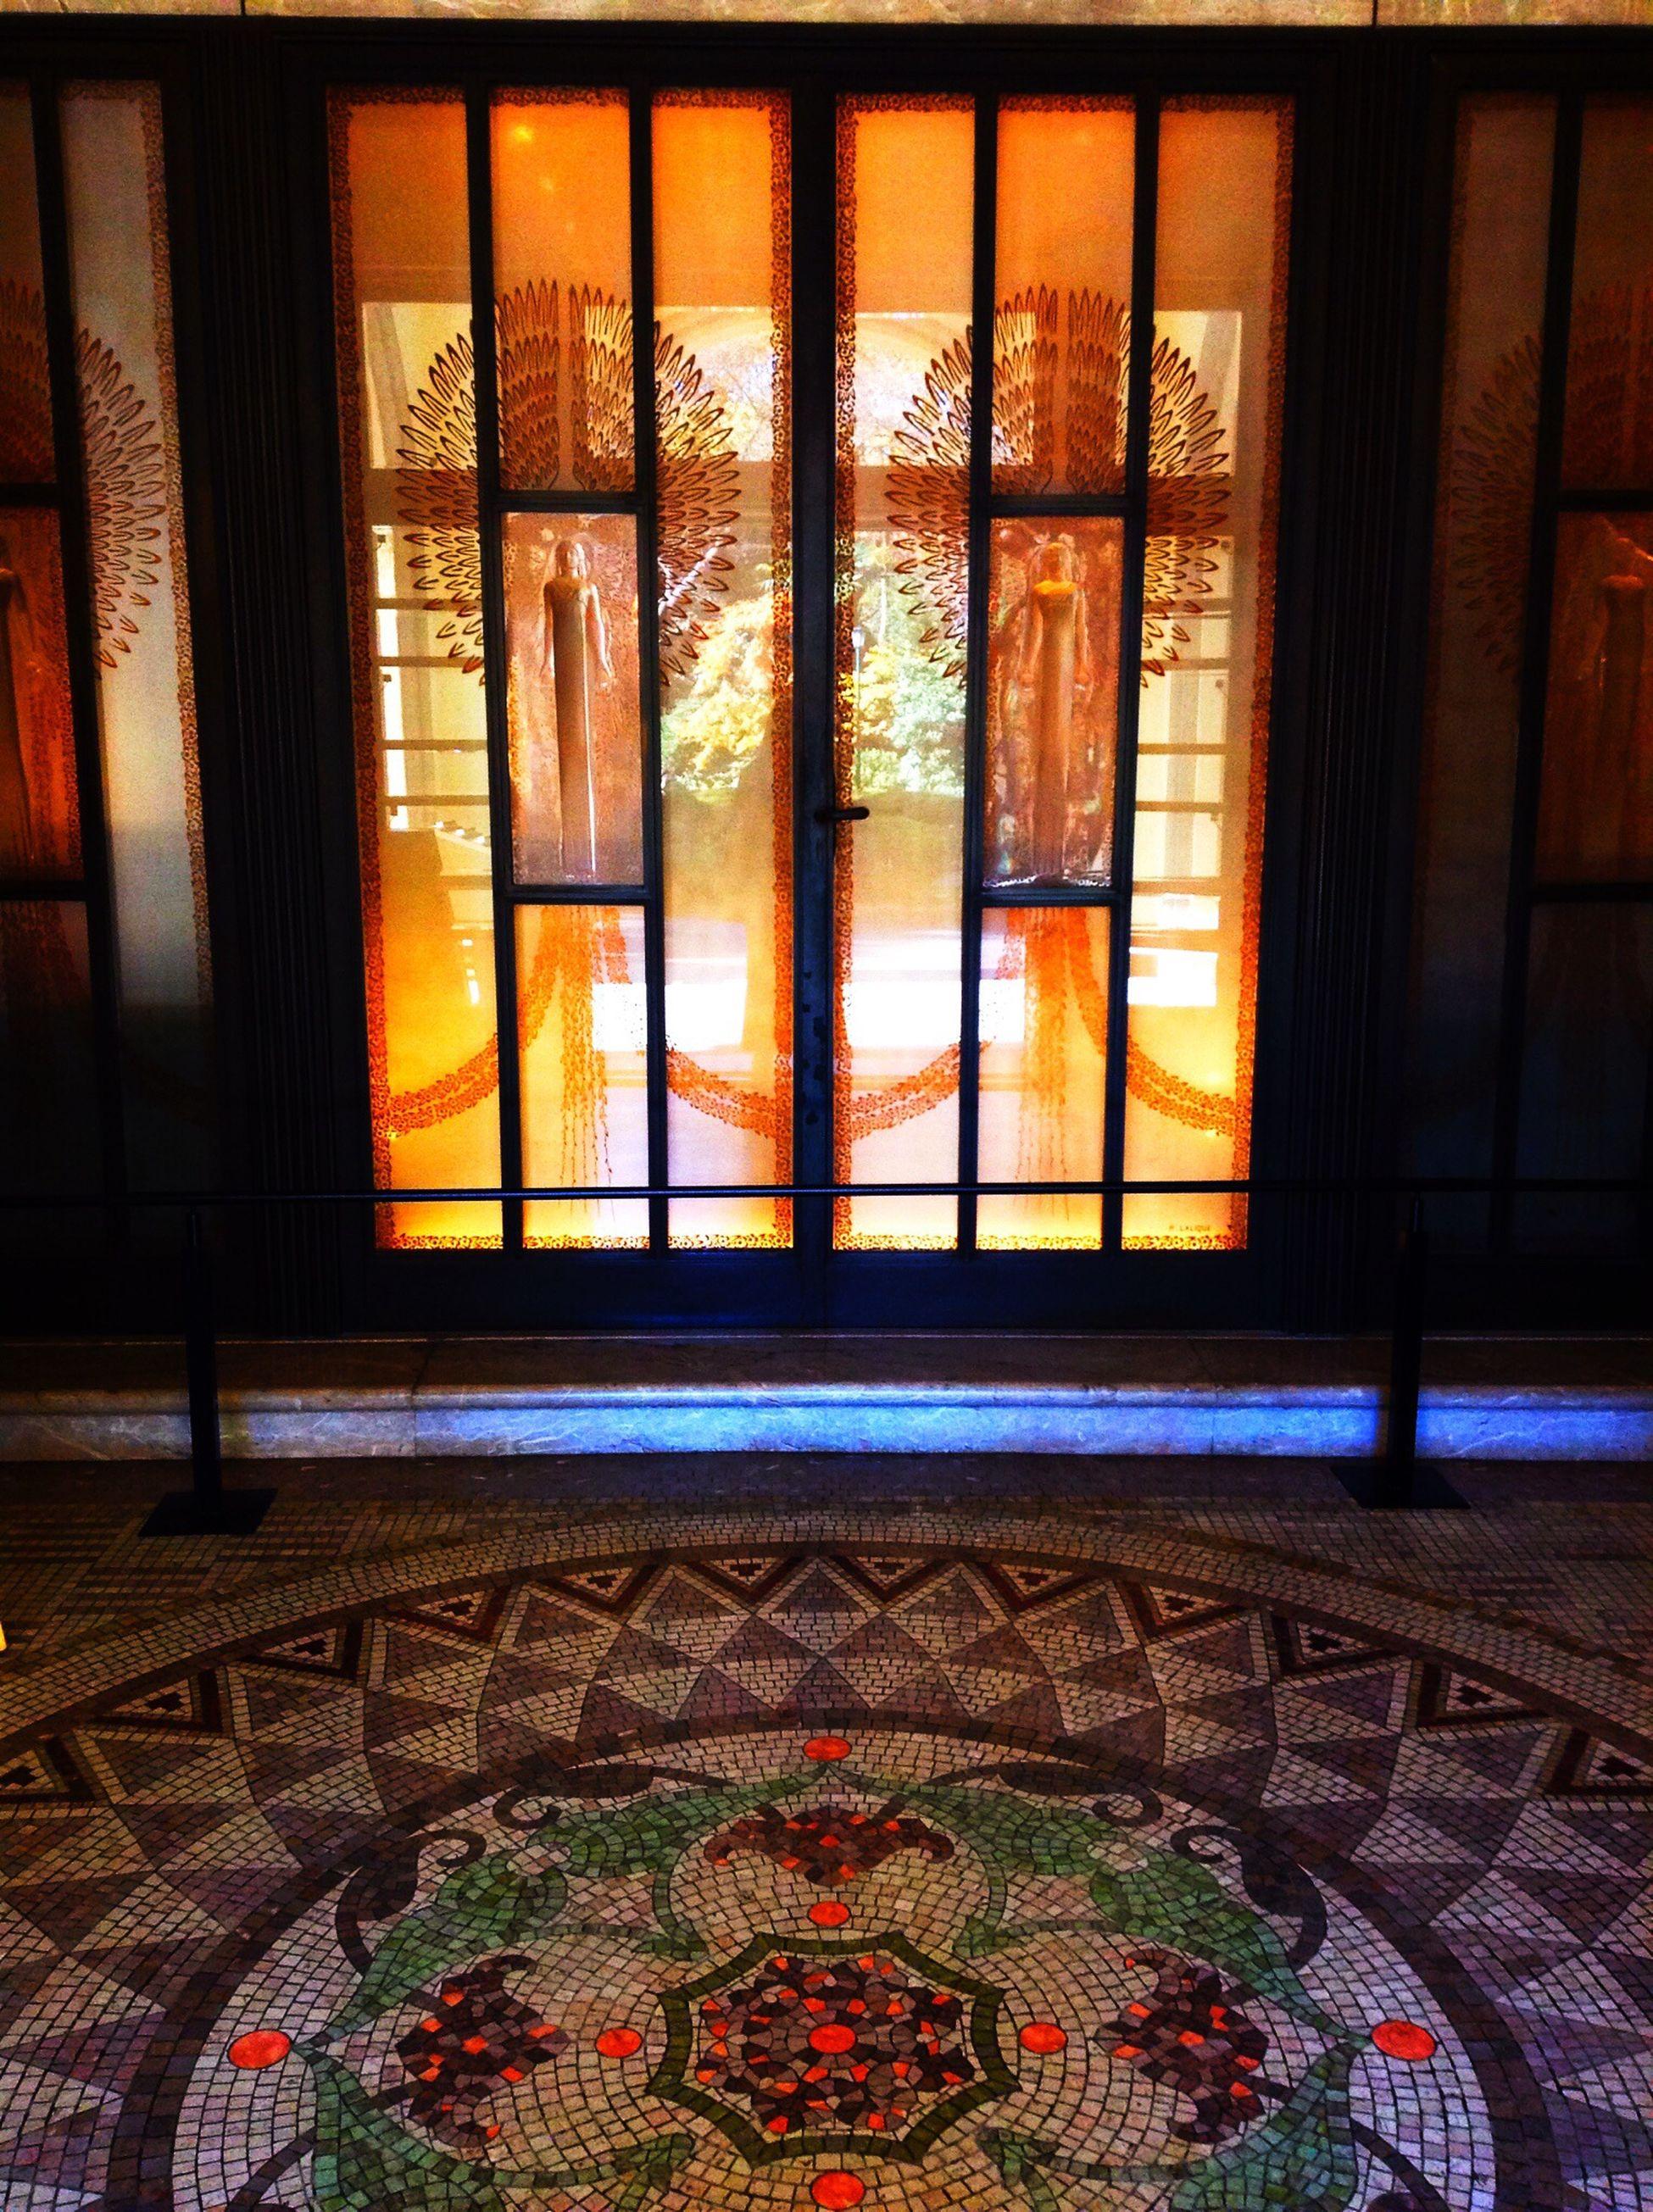 Art Deco Architecture Art Deco Museam Architecture Mosaic アールデコ 旧朝香宮邸 1933. Lalique TTTokyoJJJapan